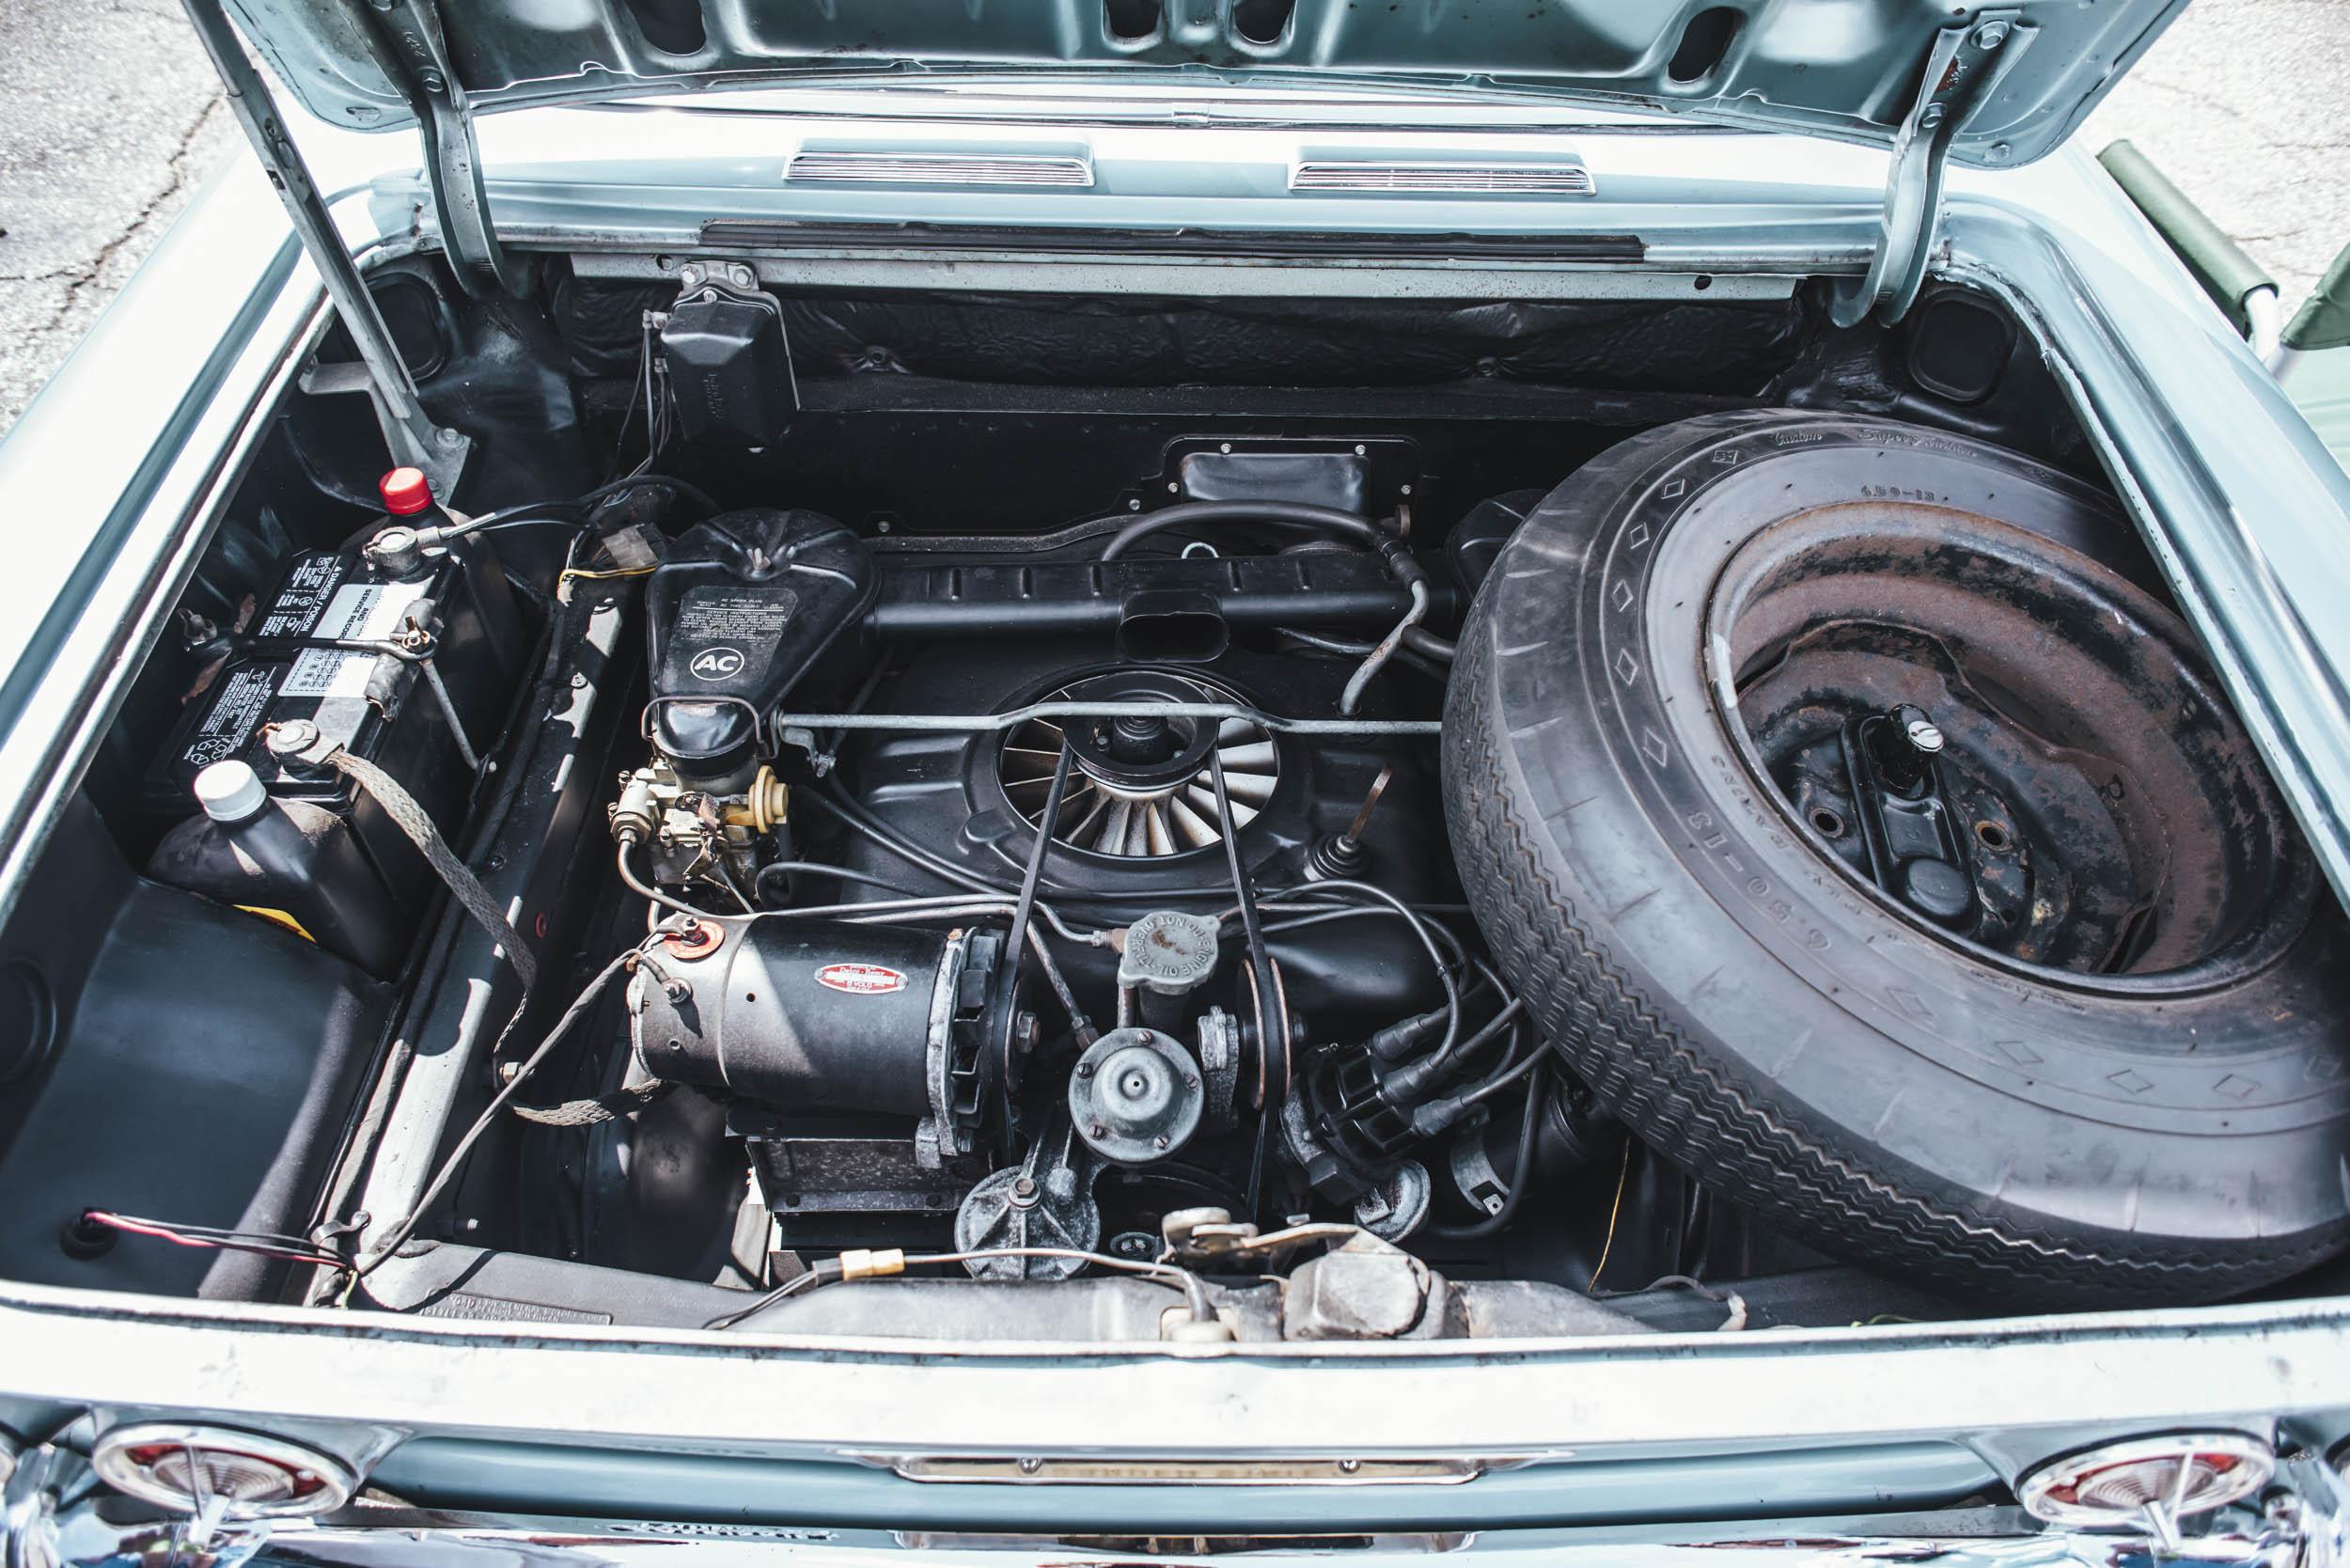 1963 Chevrolet Corvair Monza engine